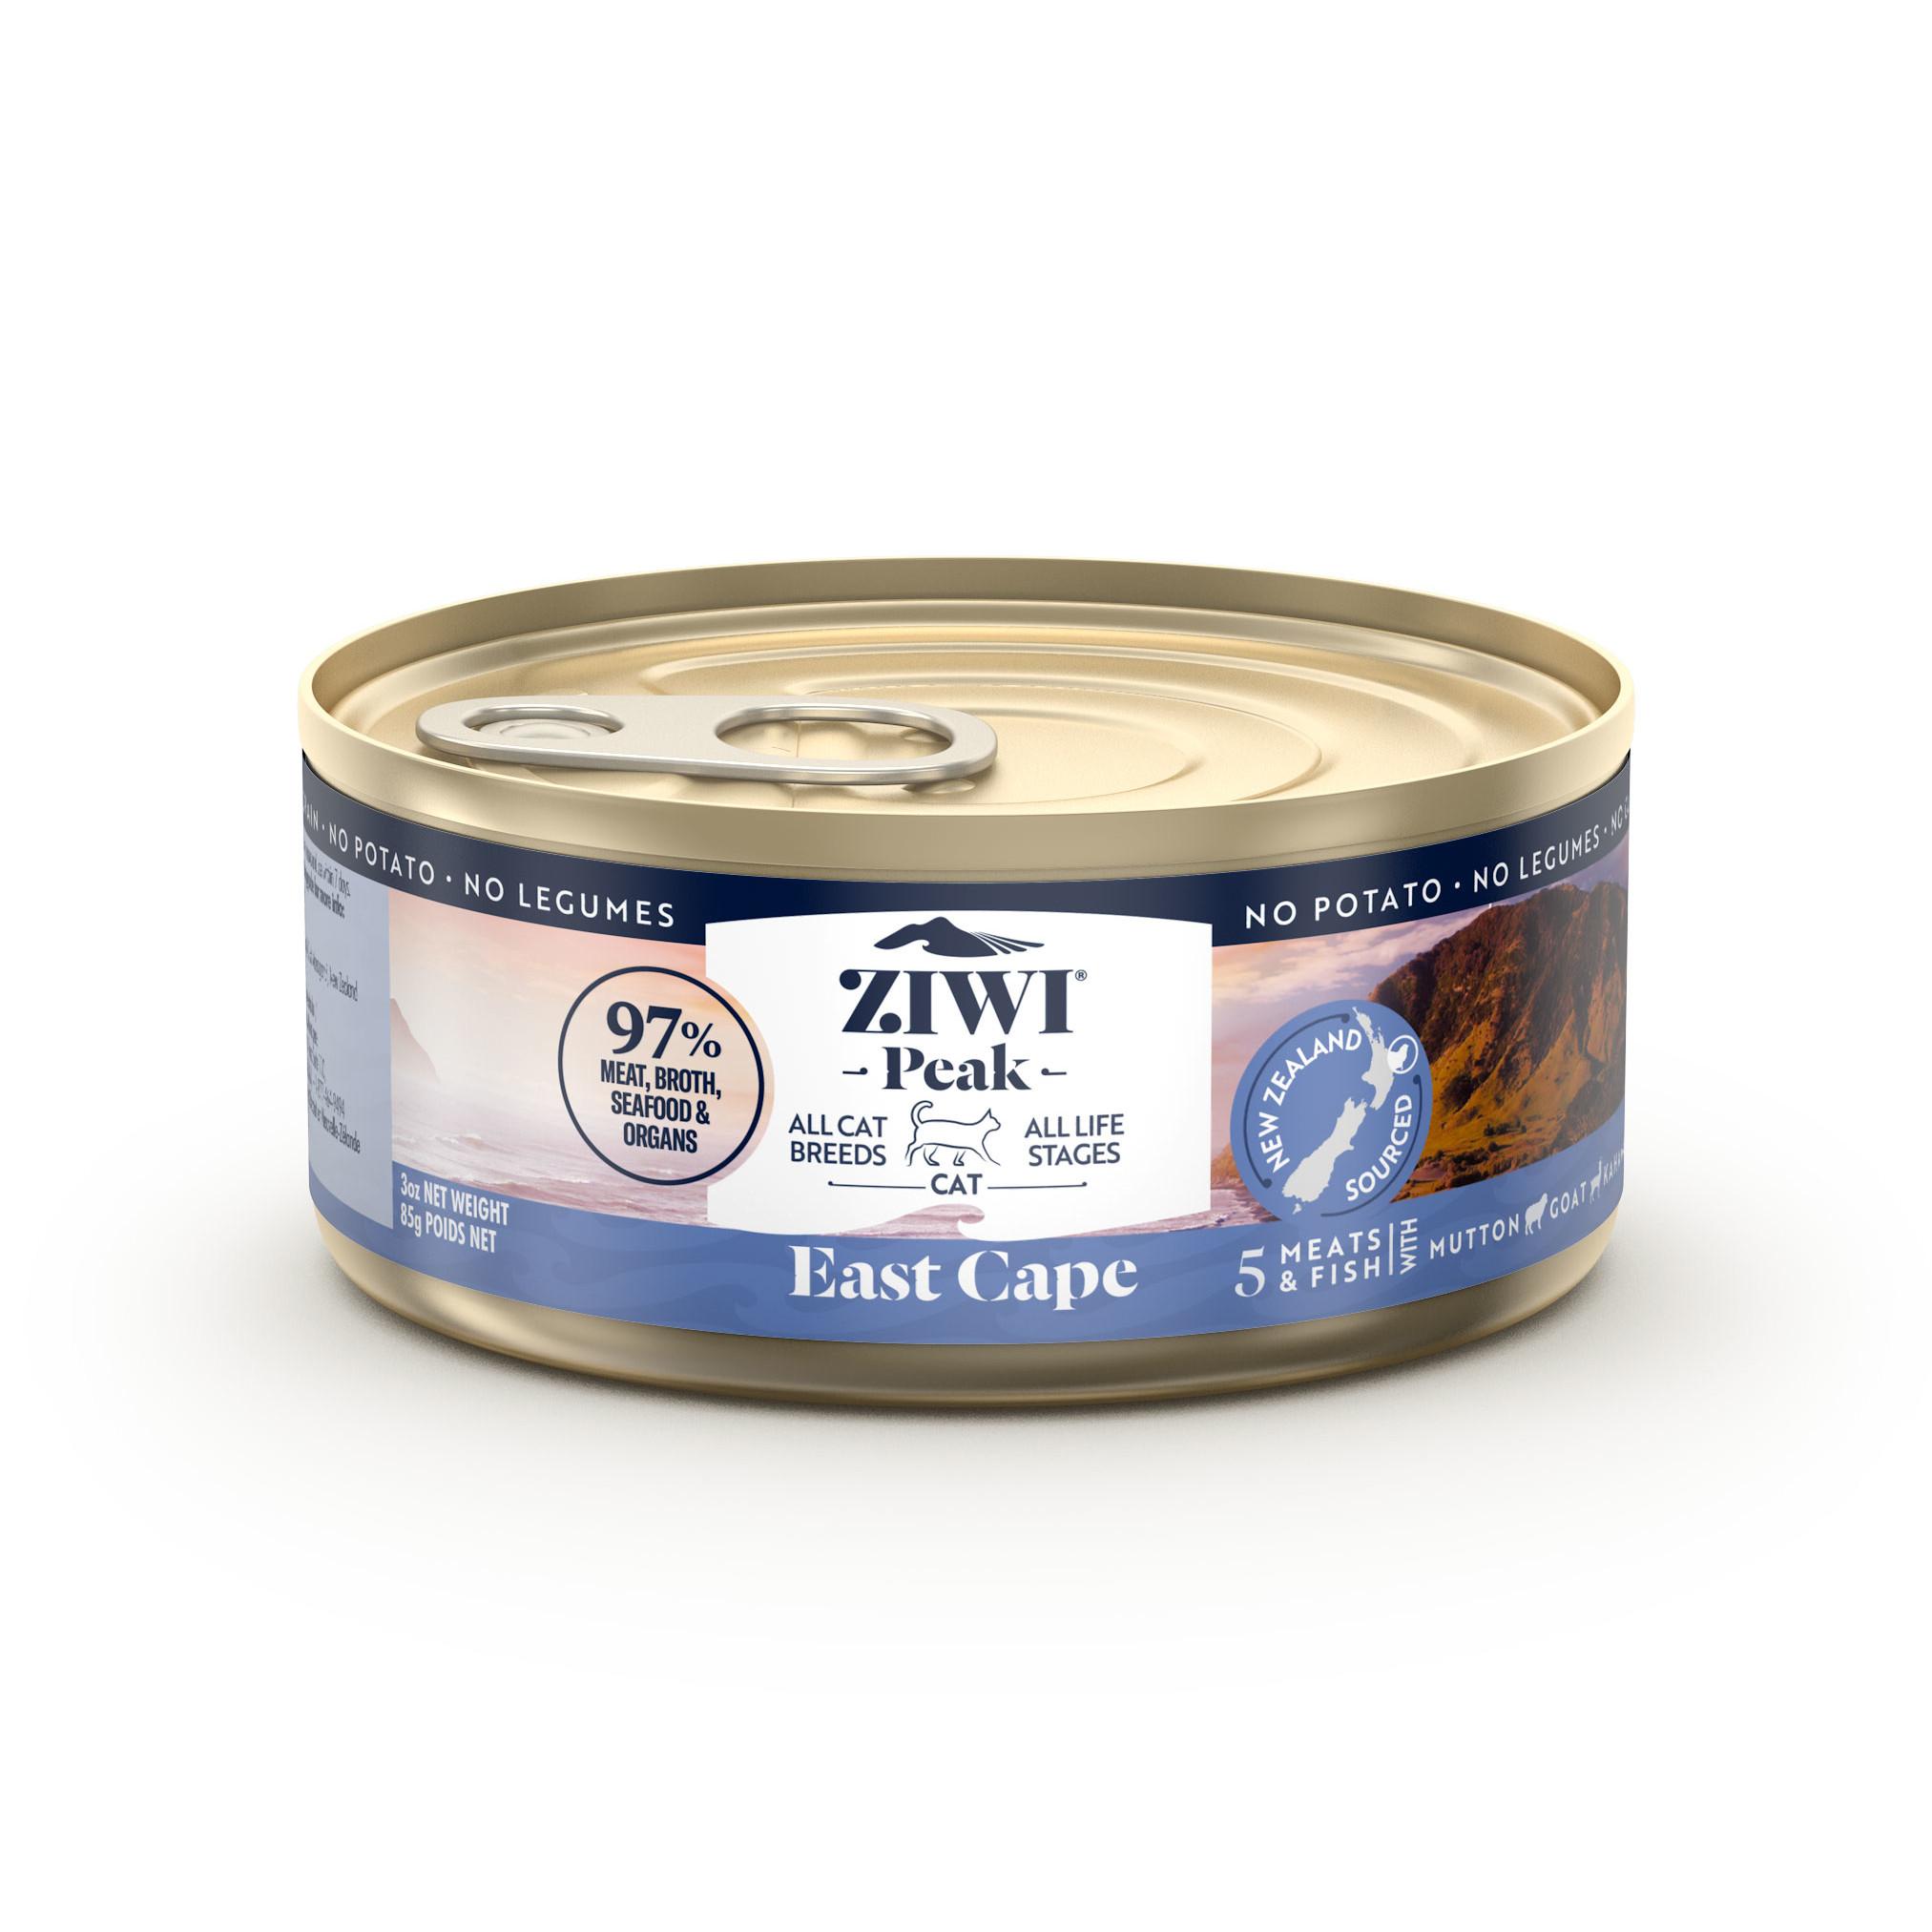 ZIWI Peak Provenance Canned Cat Food East Cape Recipe, 3-oz